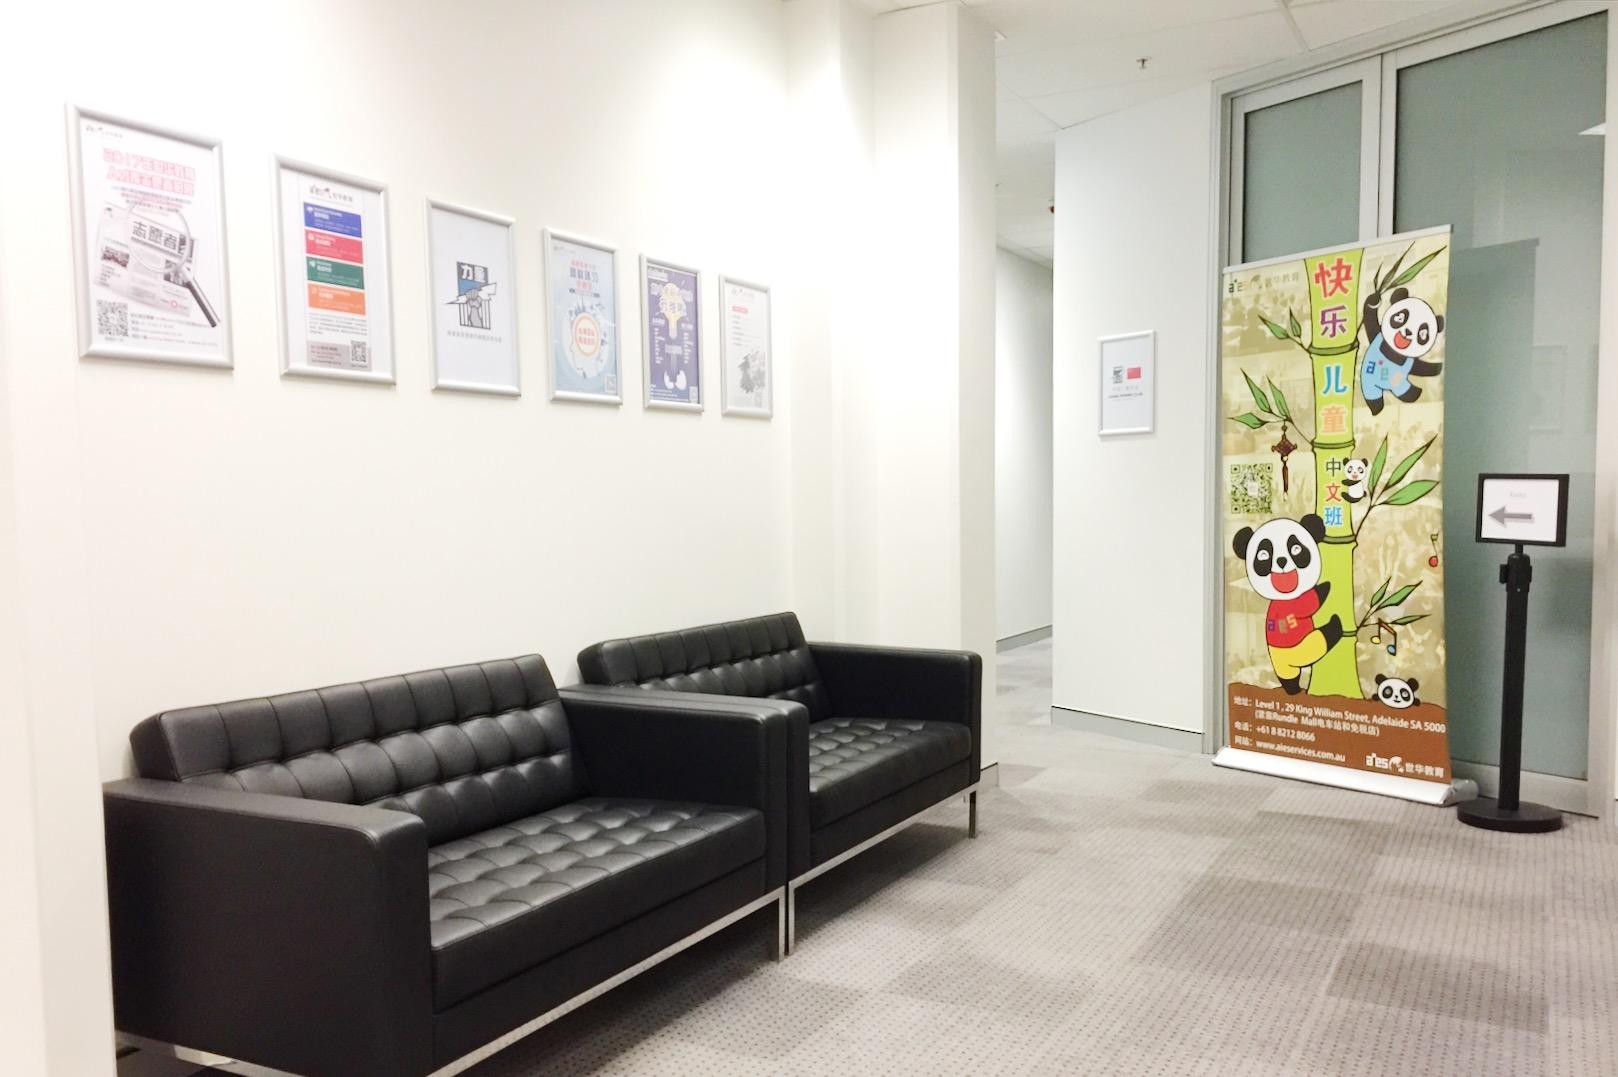 aies-training-room-entrance.jpg